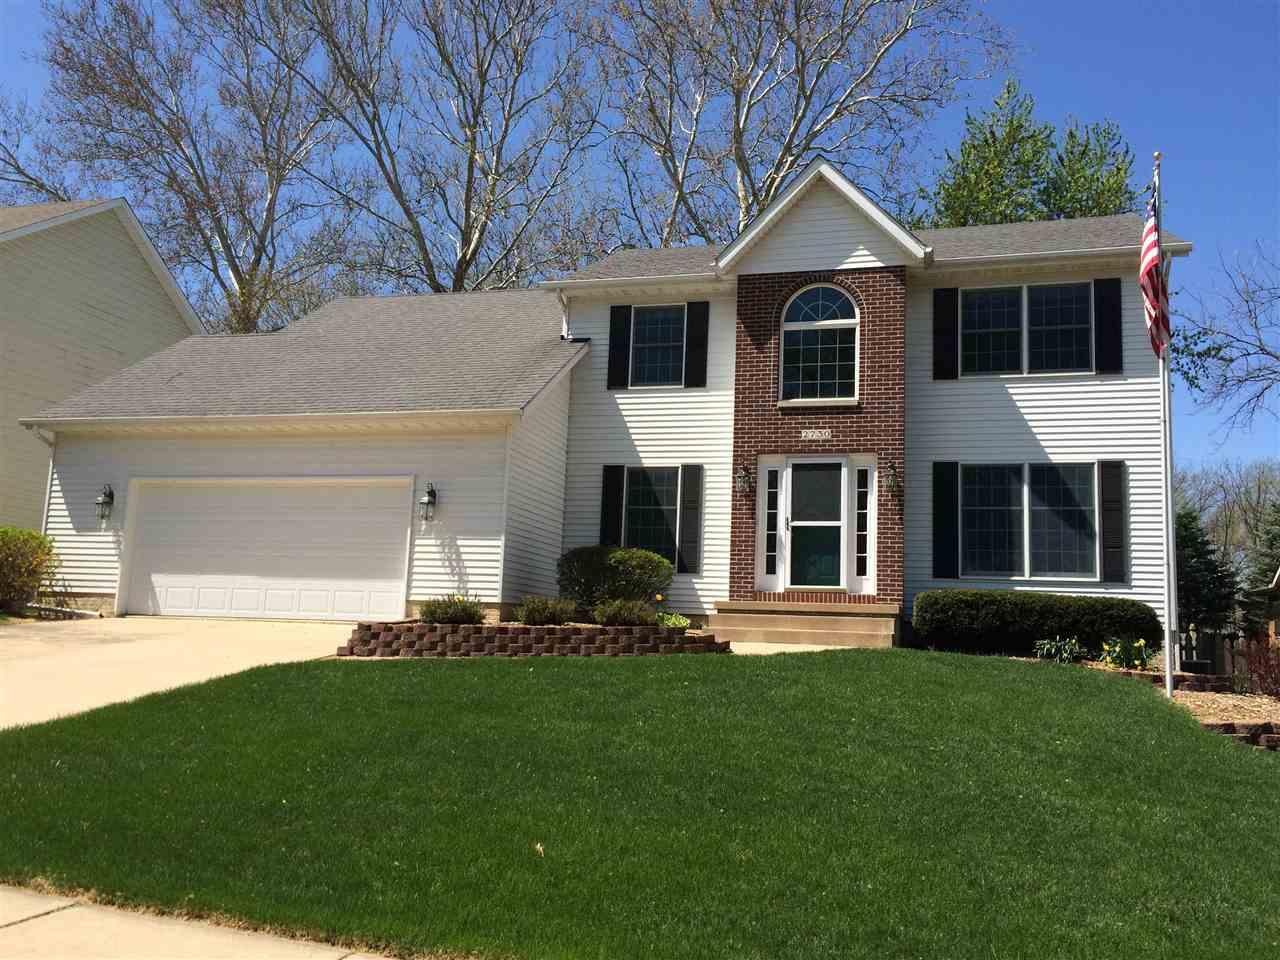 Real Estate for Sale, ListingId: 32946770, Davenport,IA52803